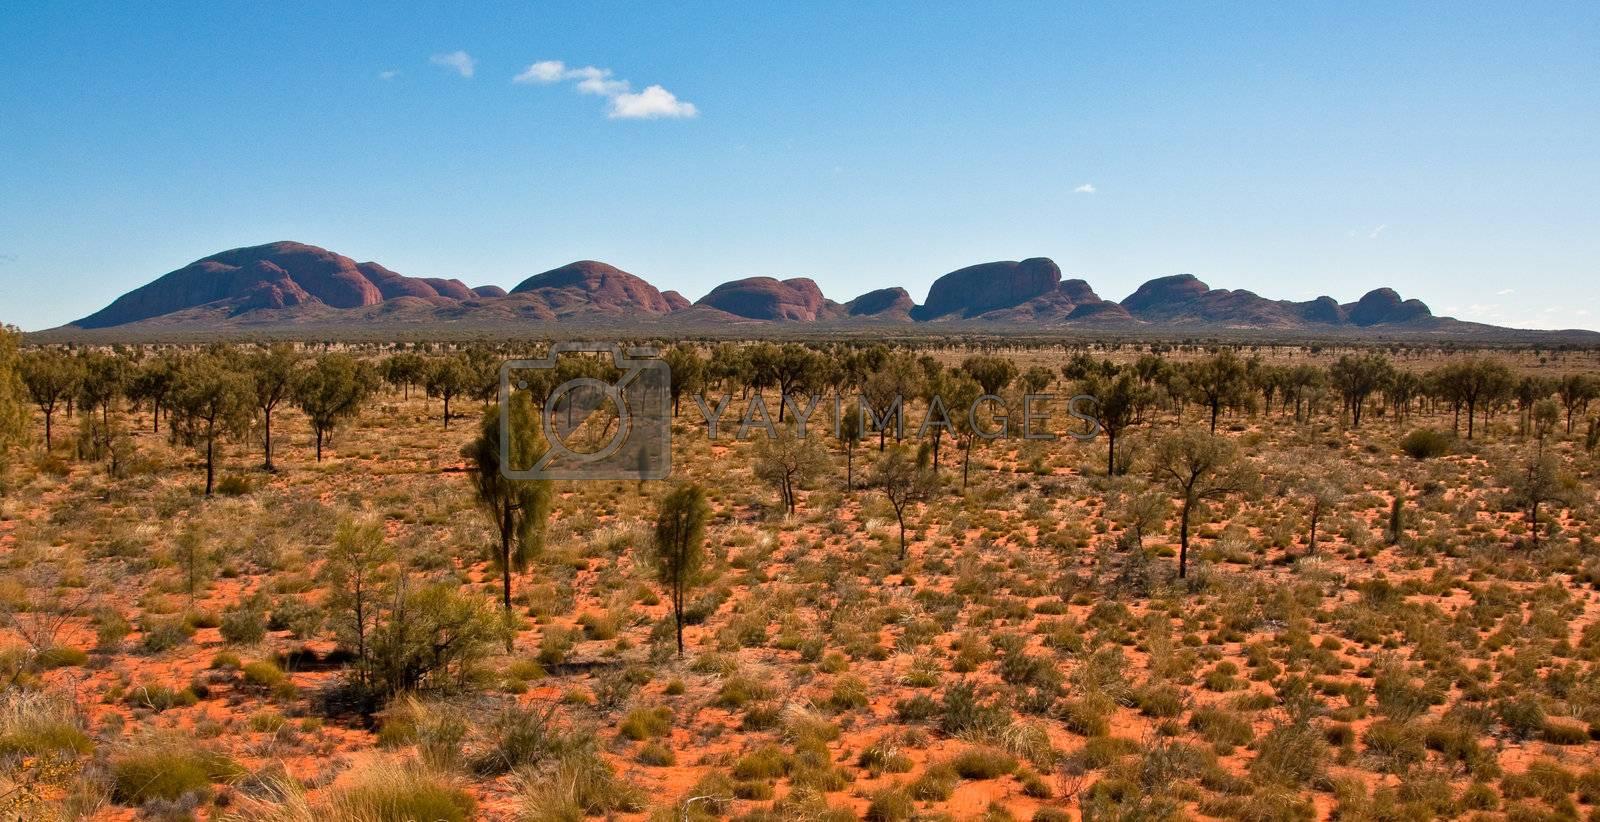 panoramic view of Kata Tjuta, australian red center